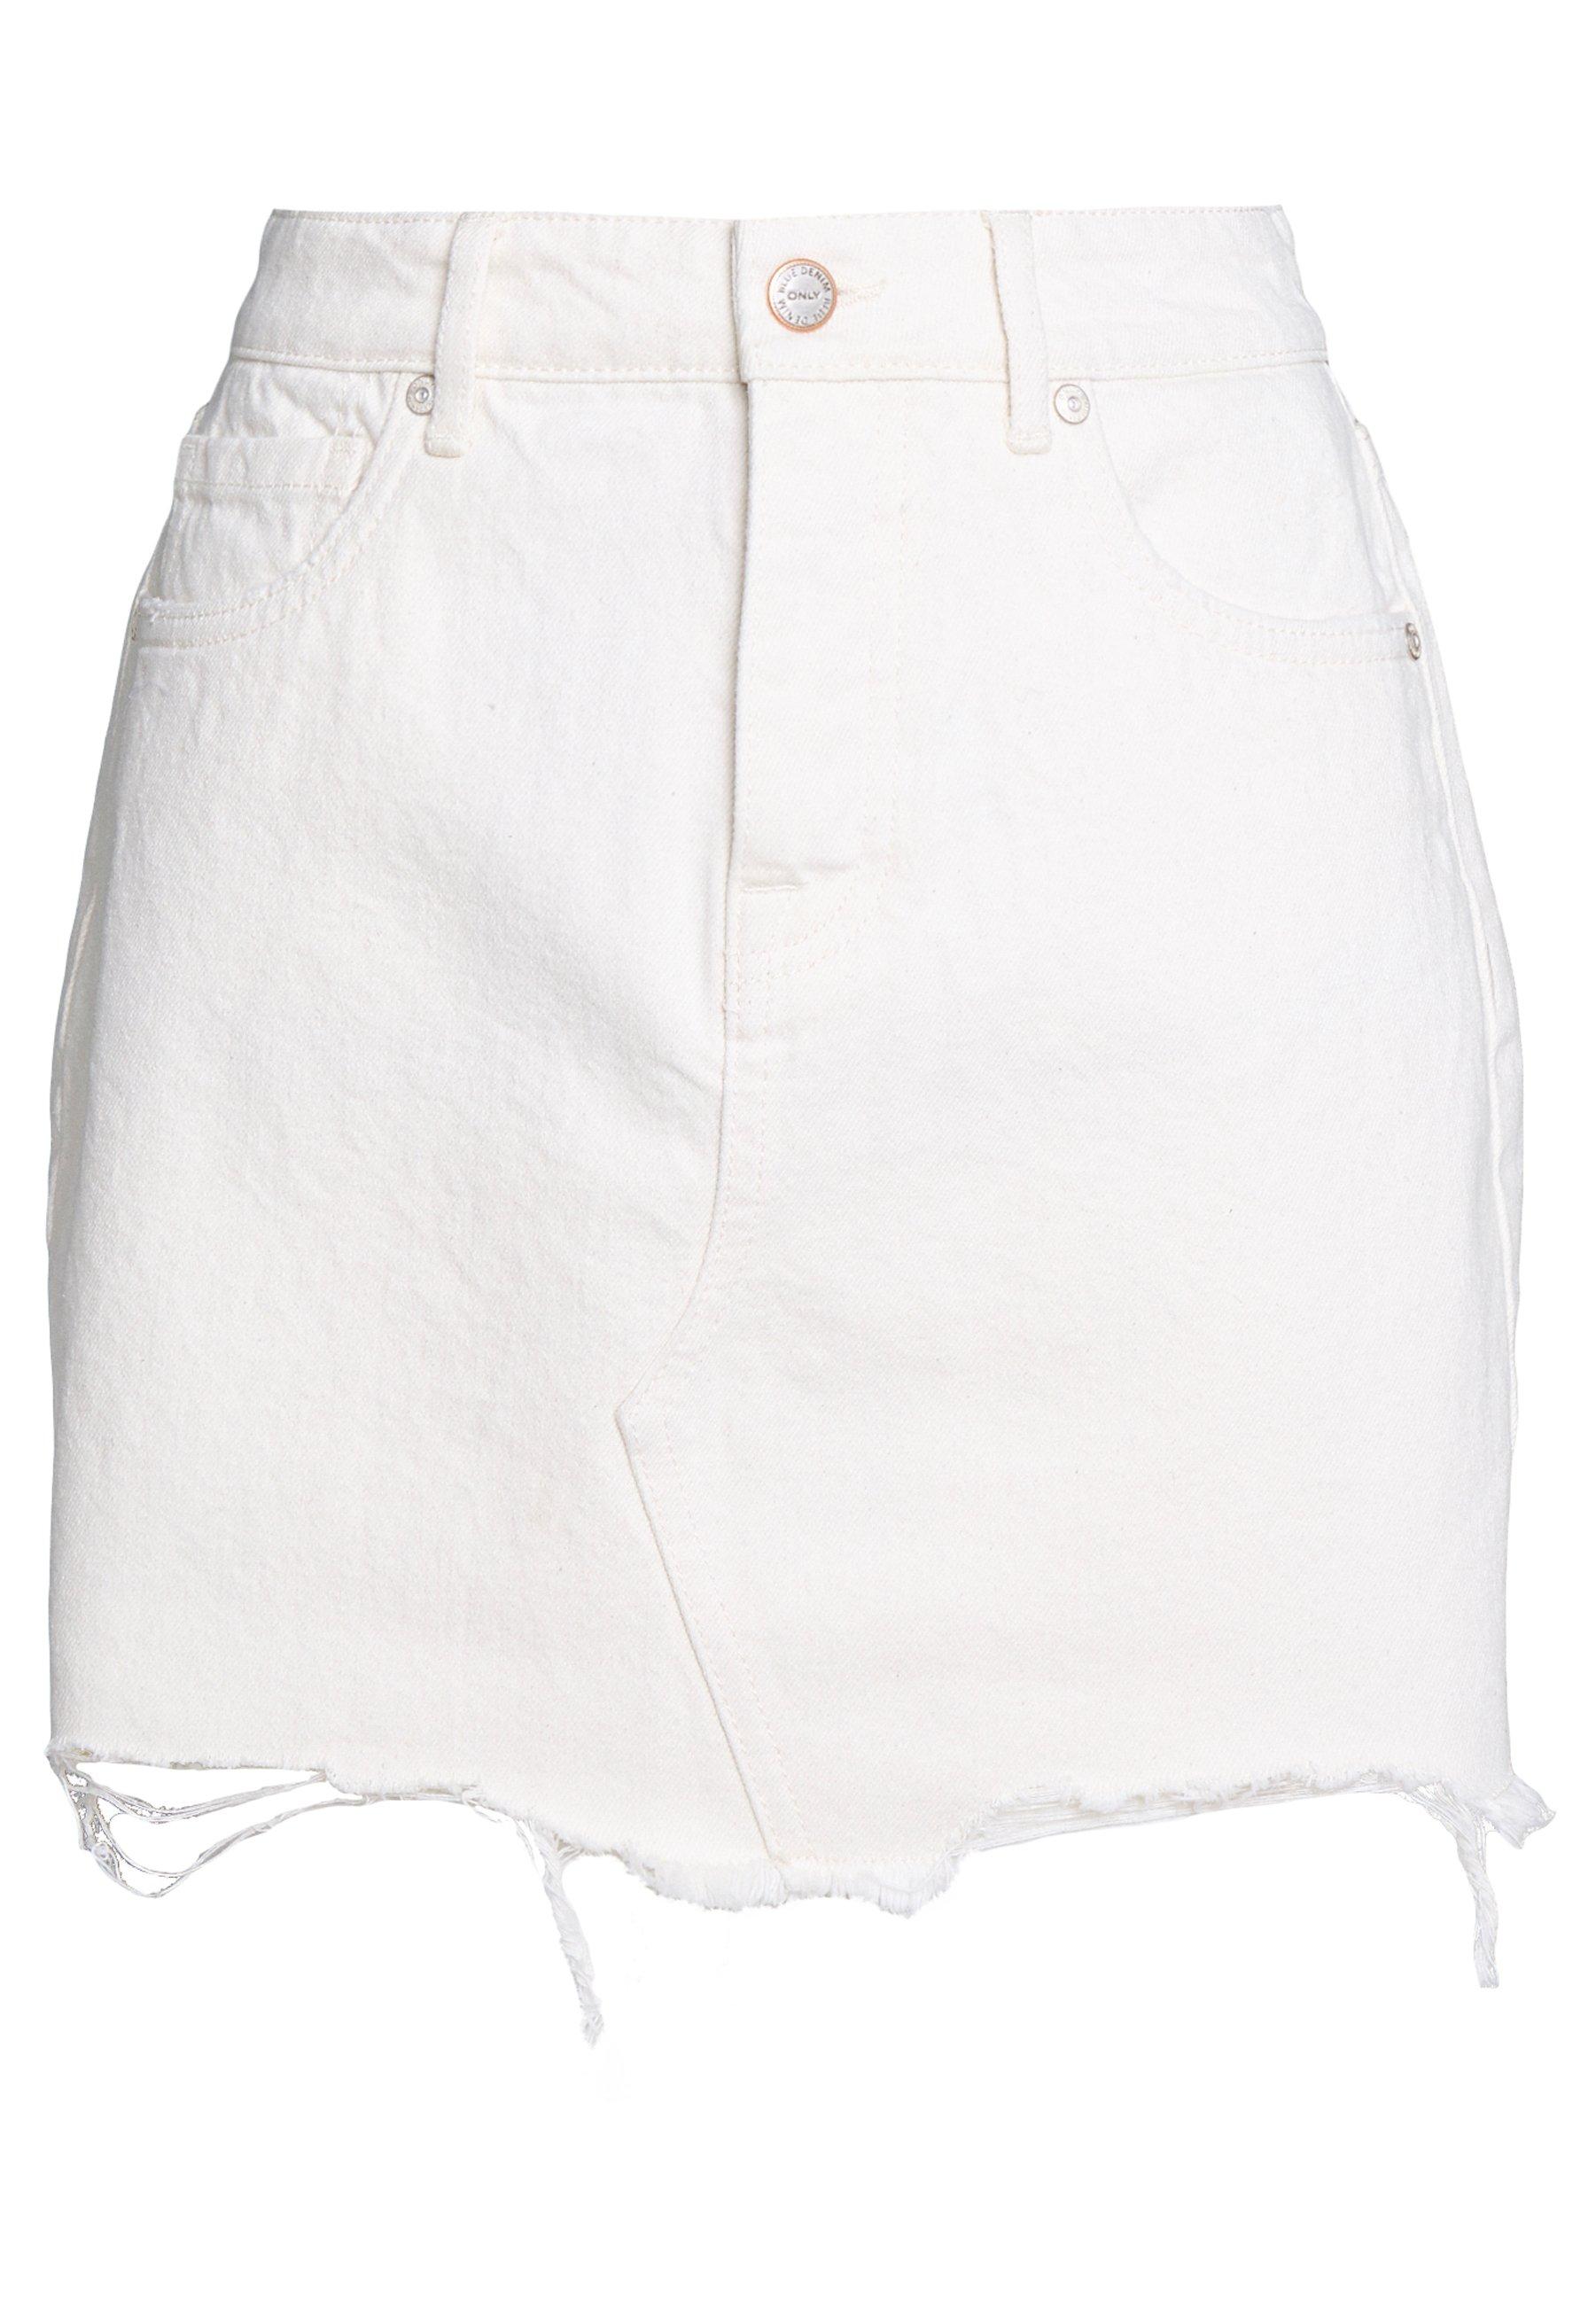 Femme ONLSKY SKIRT RAW EDGE - Jupe en jean